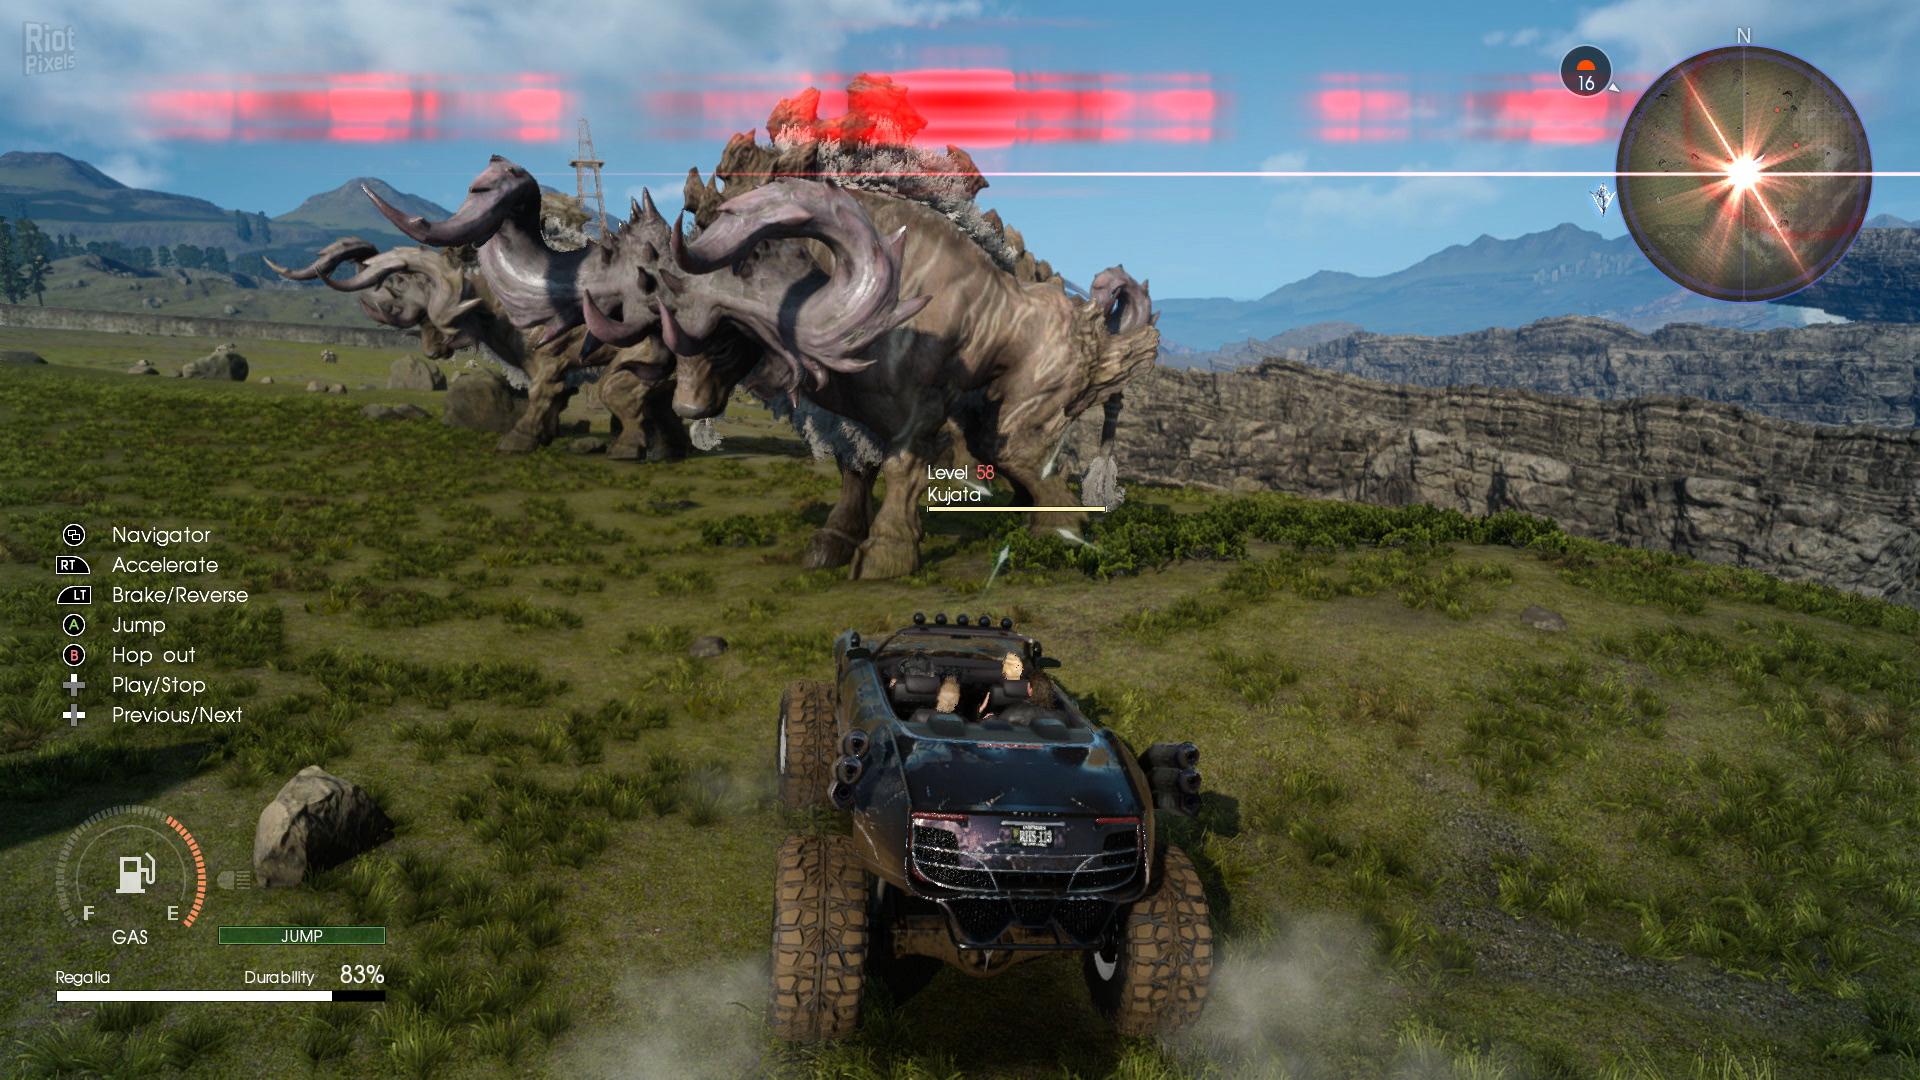 Final Fantasy 15: Windows Edition - game screenshots at Riot Pixels